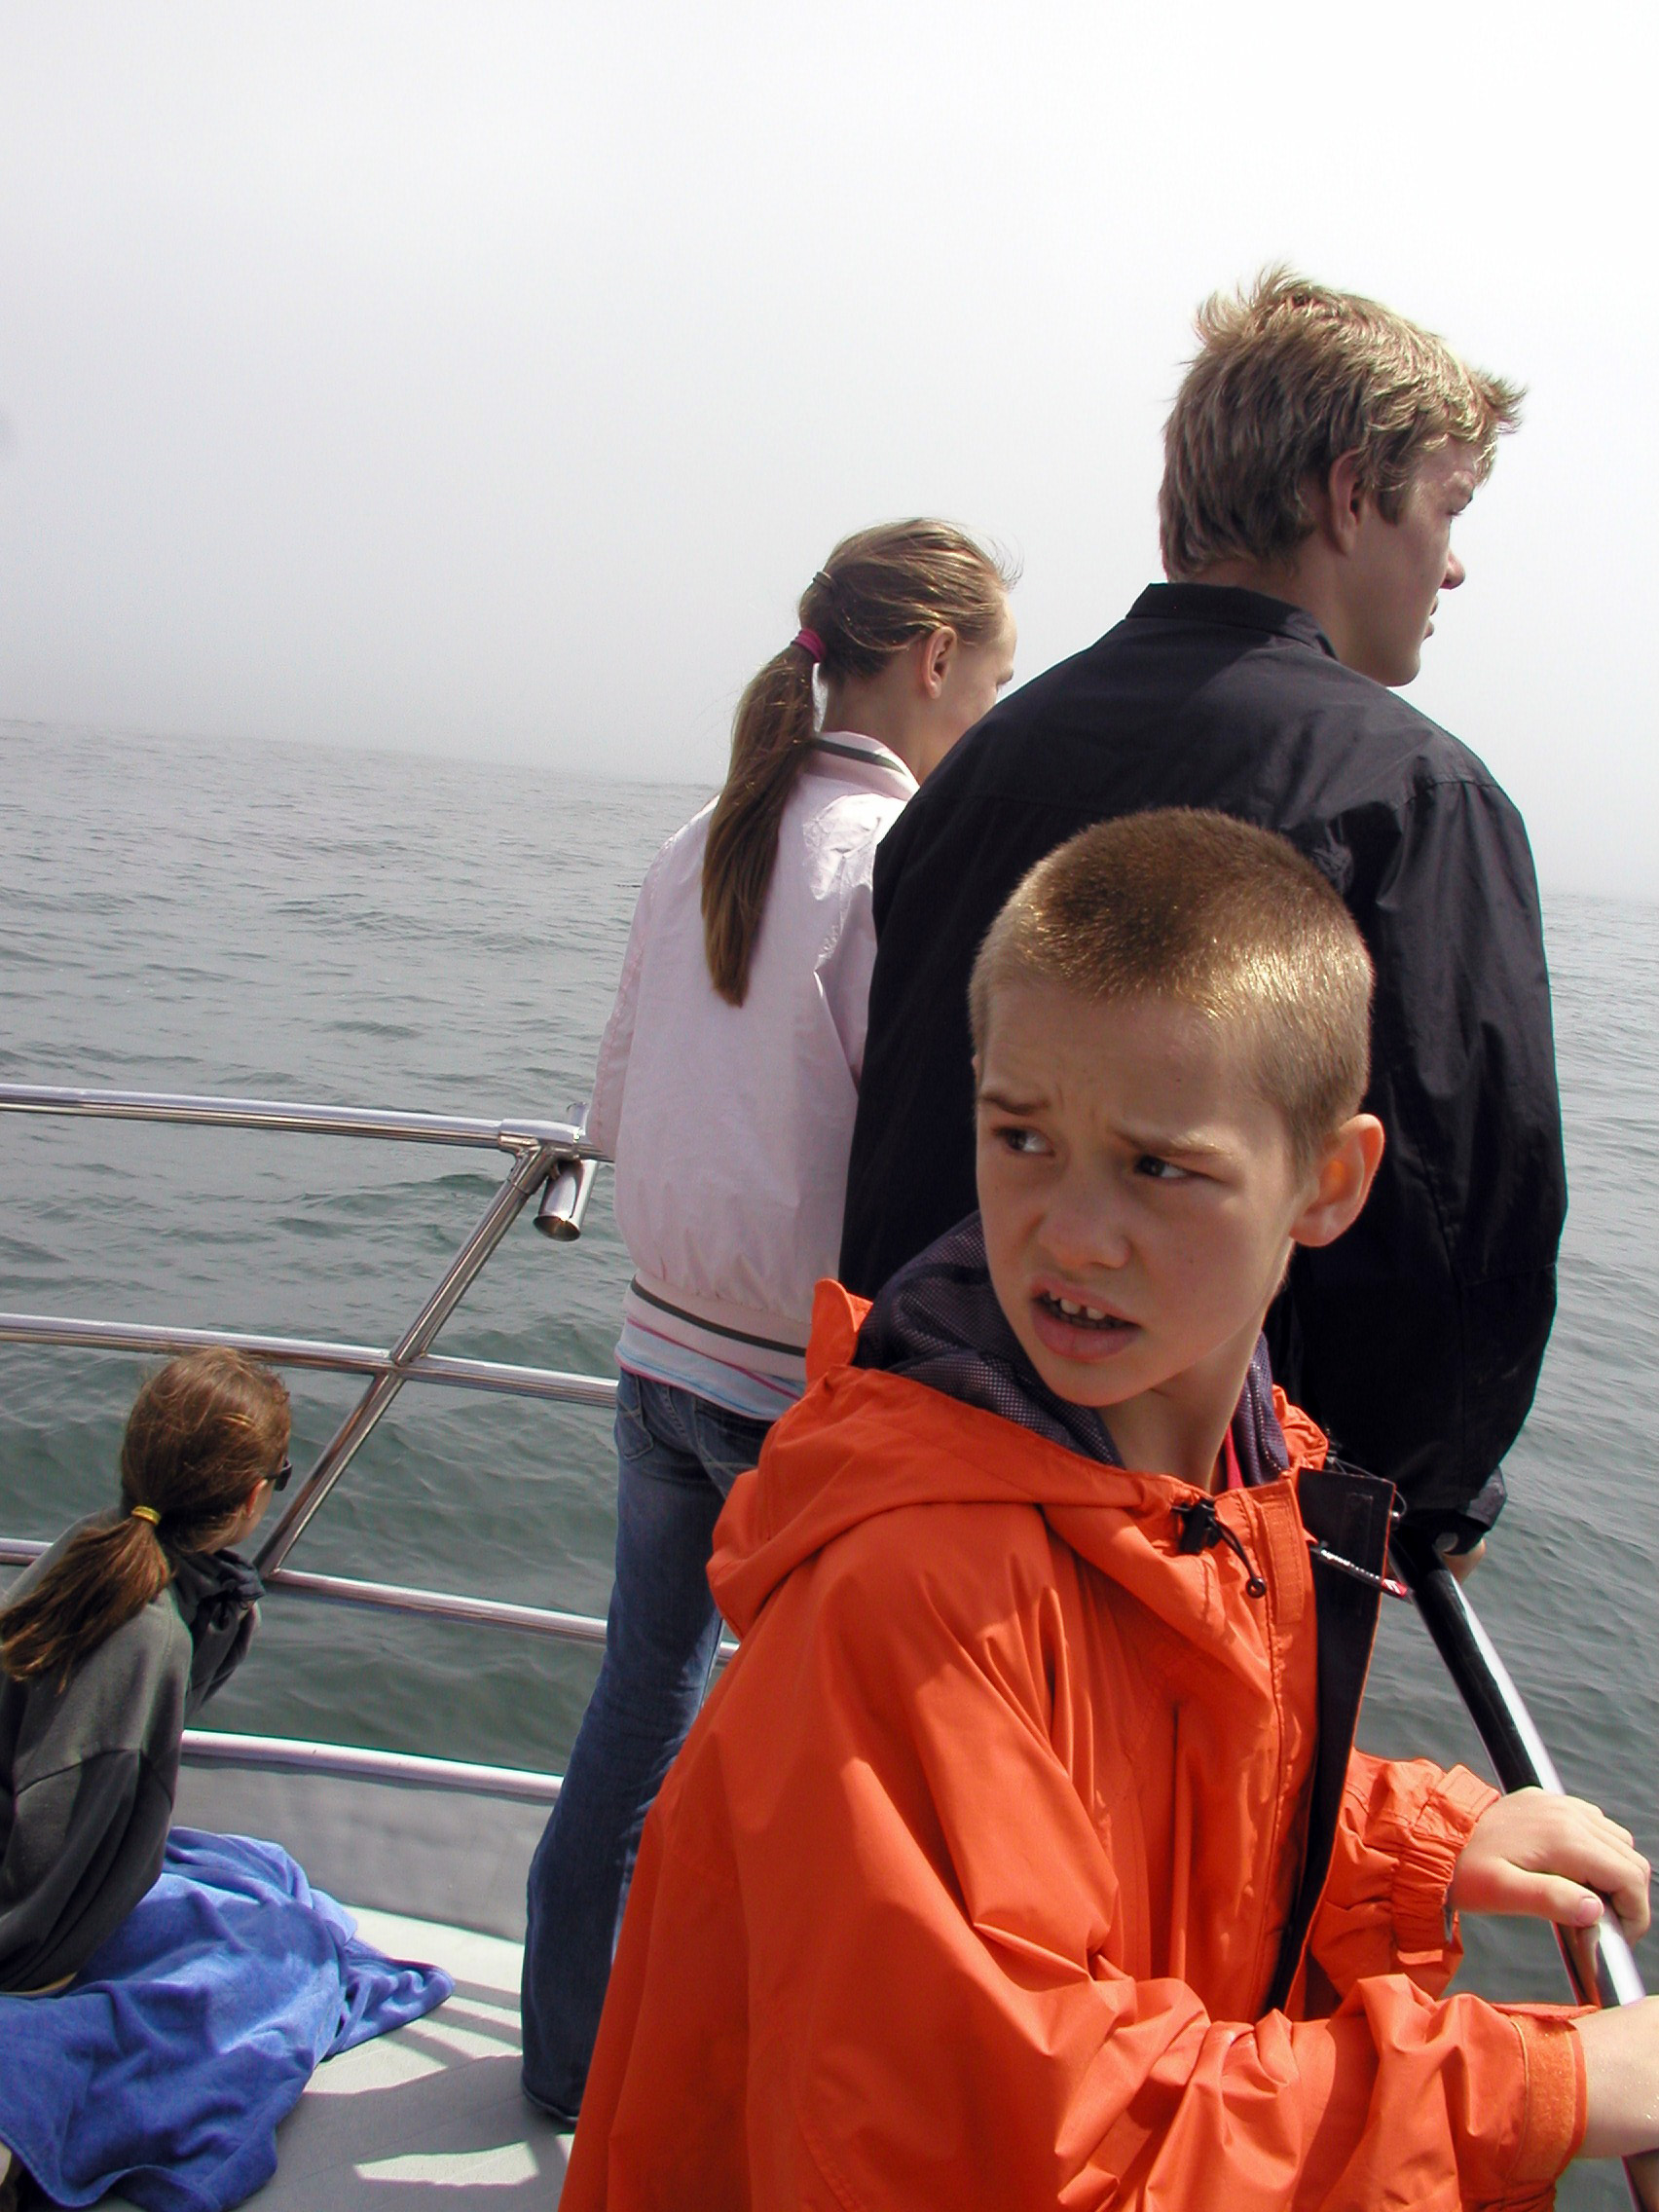 40_sarah rachel paul david on boat